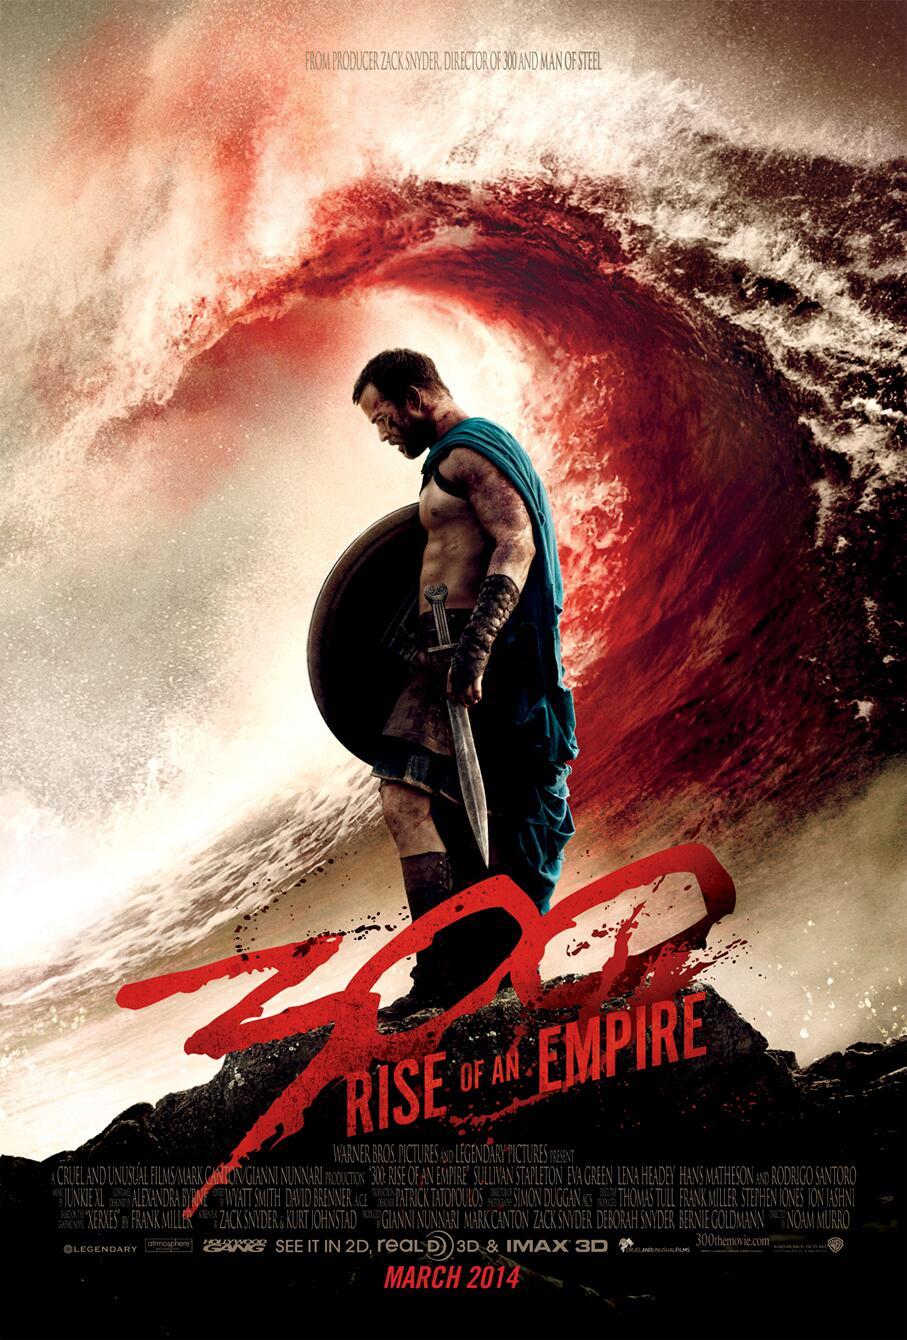 300-naissance-dun-empire-poster